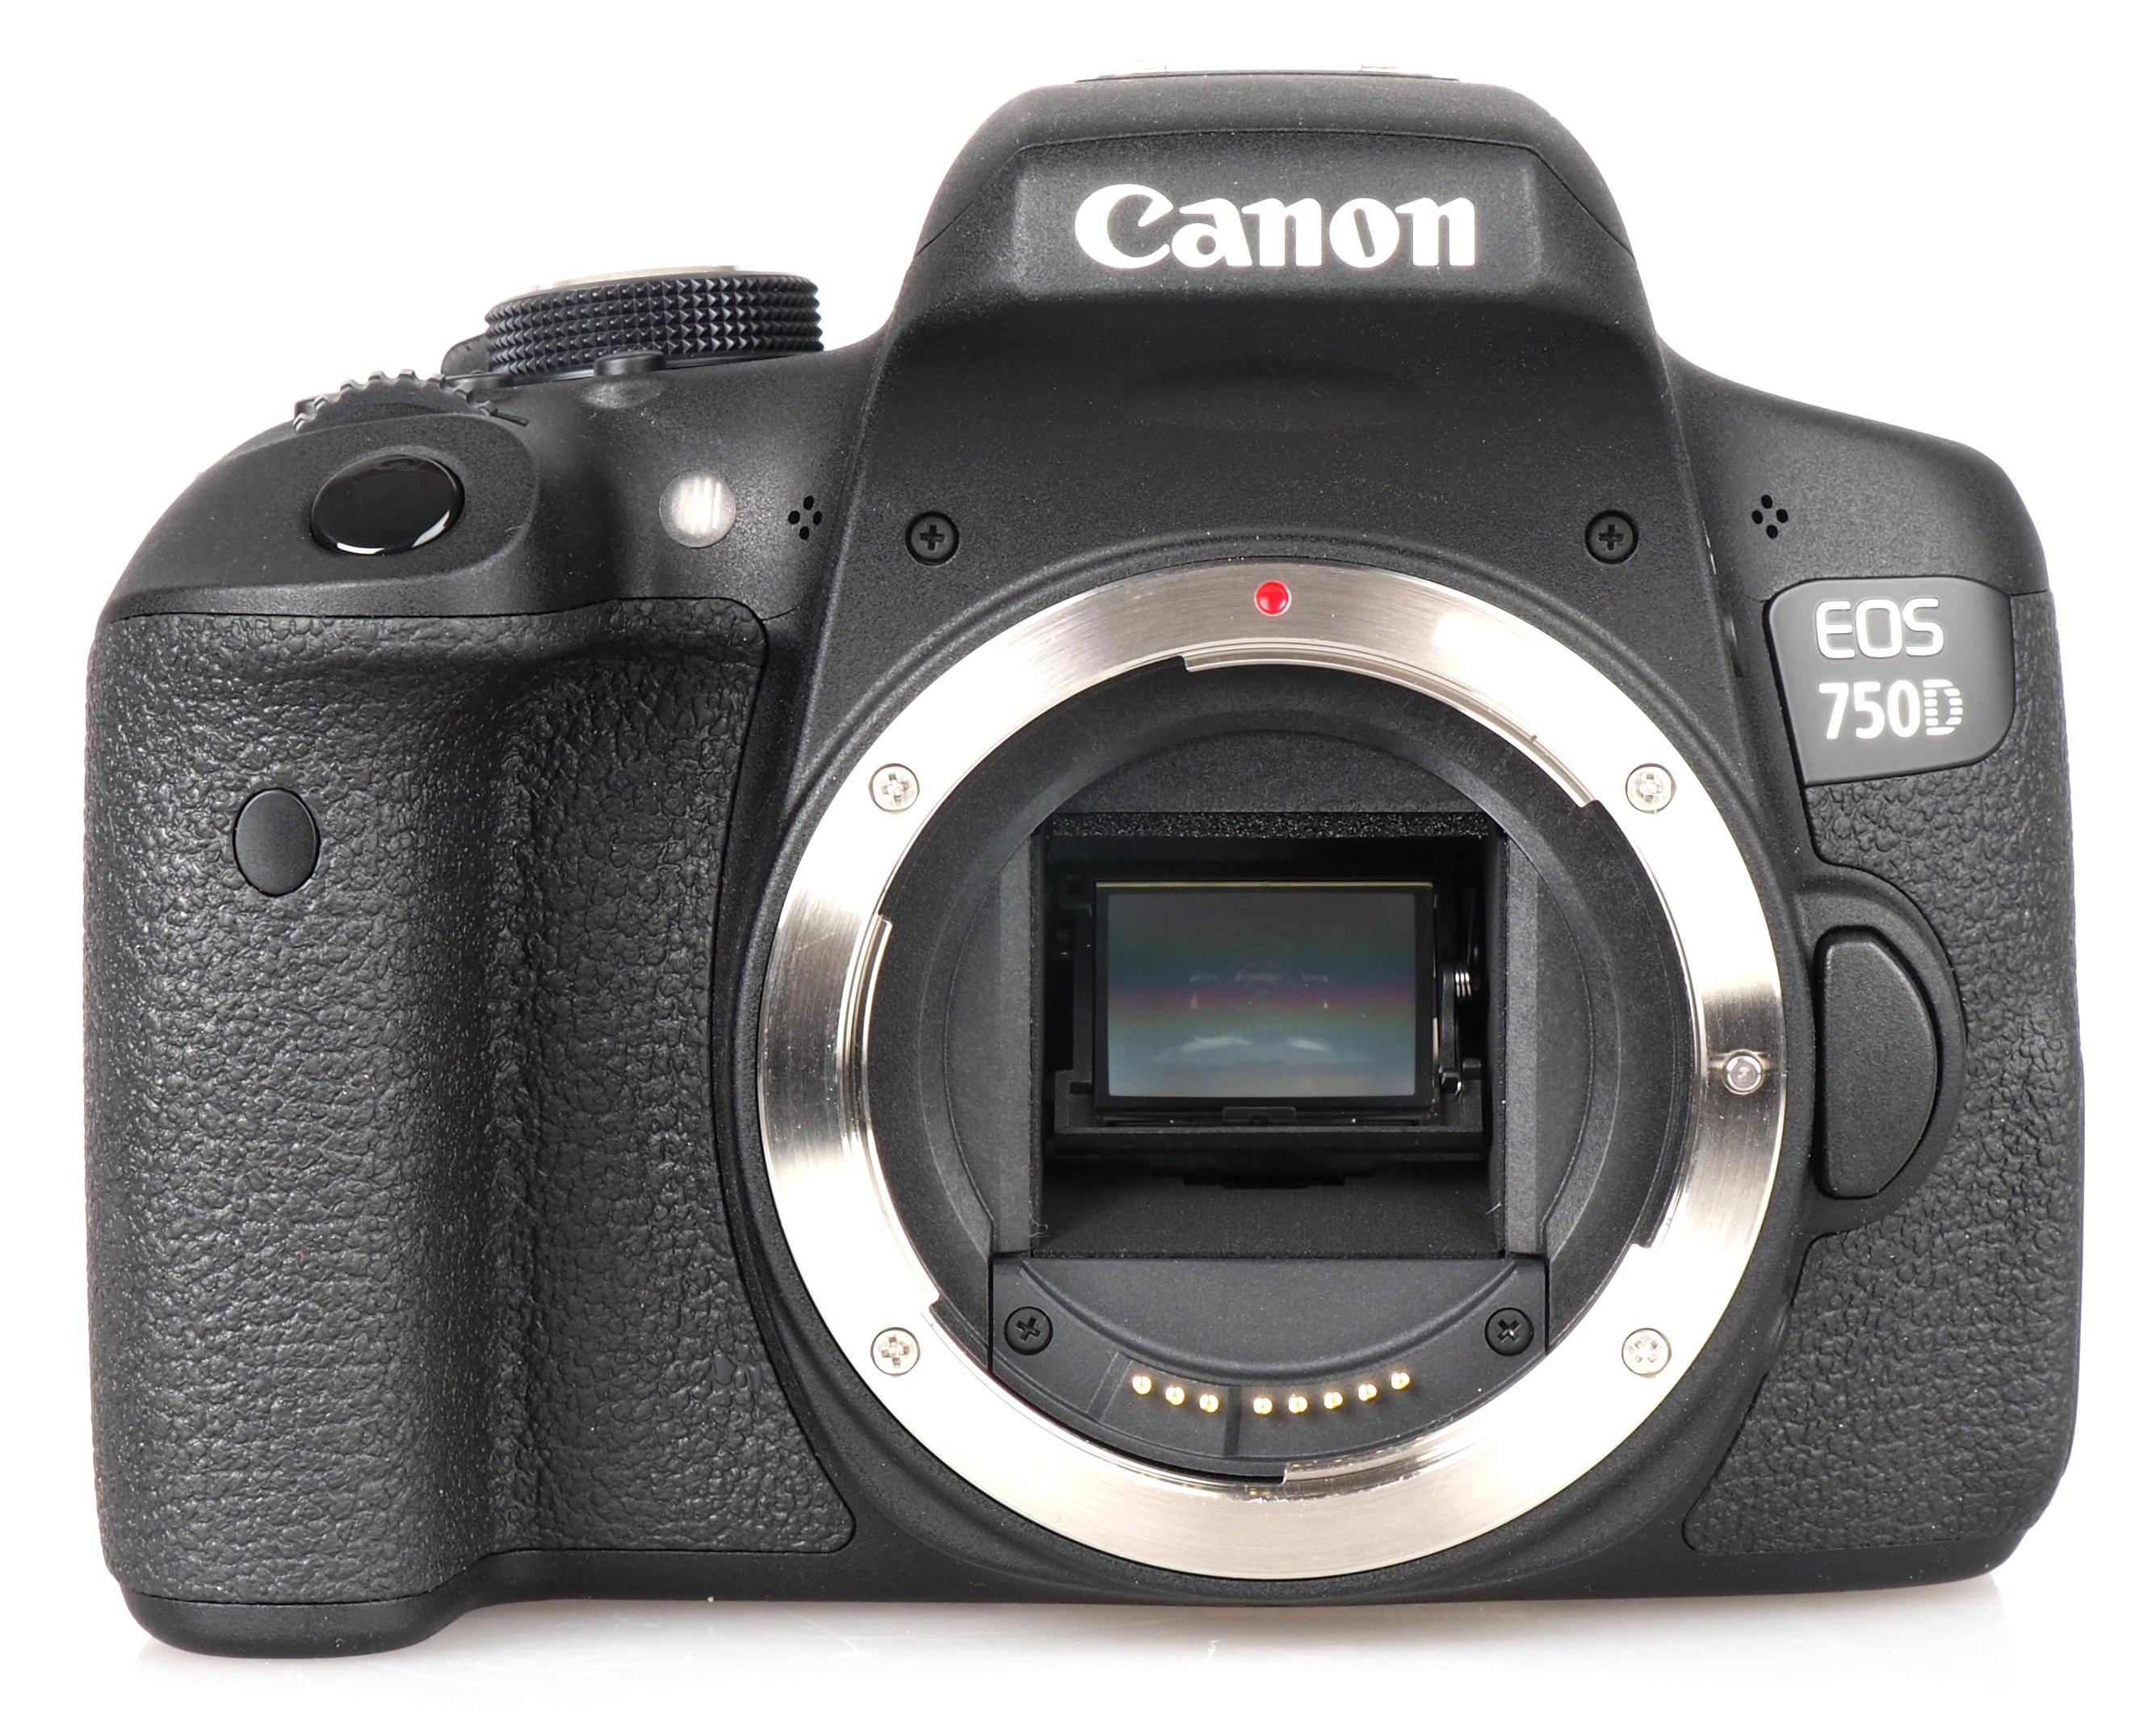 Canon Eos 750d Review